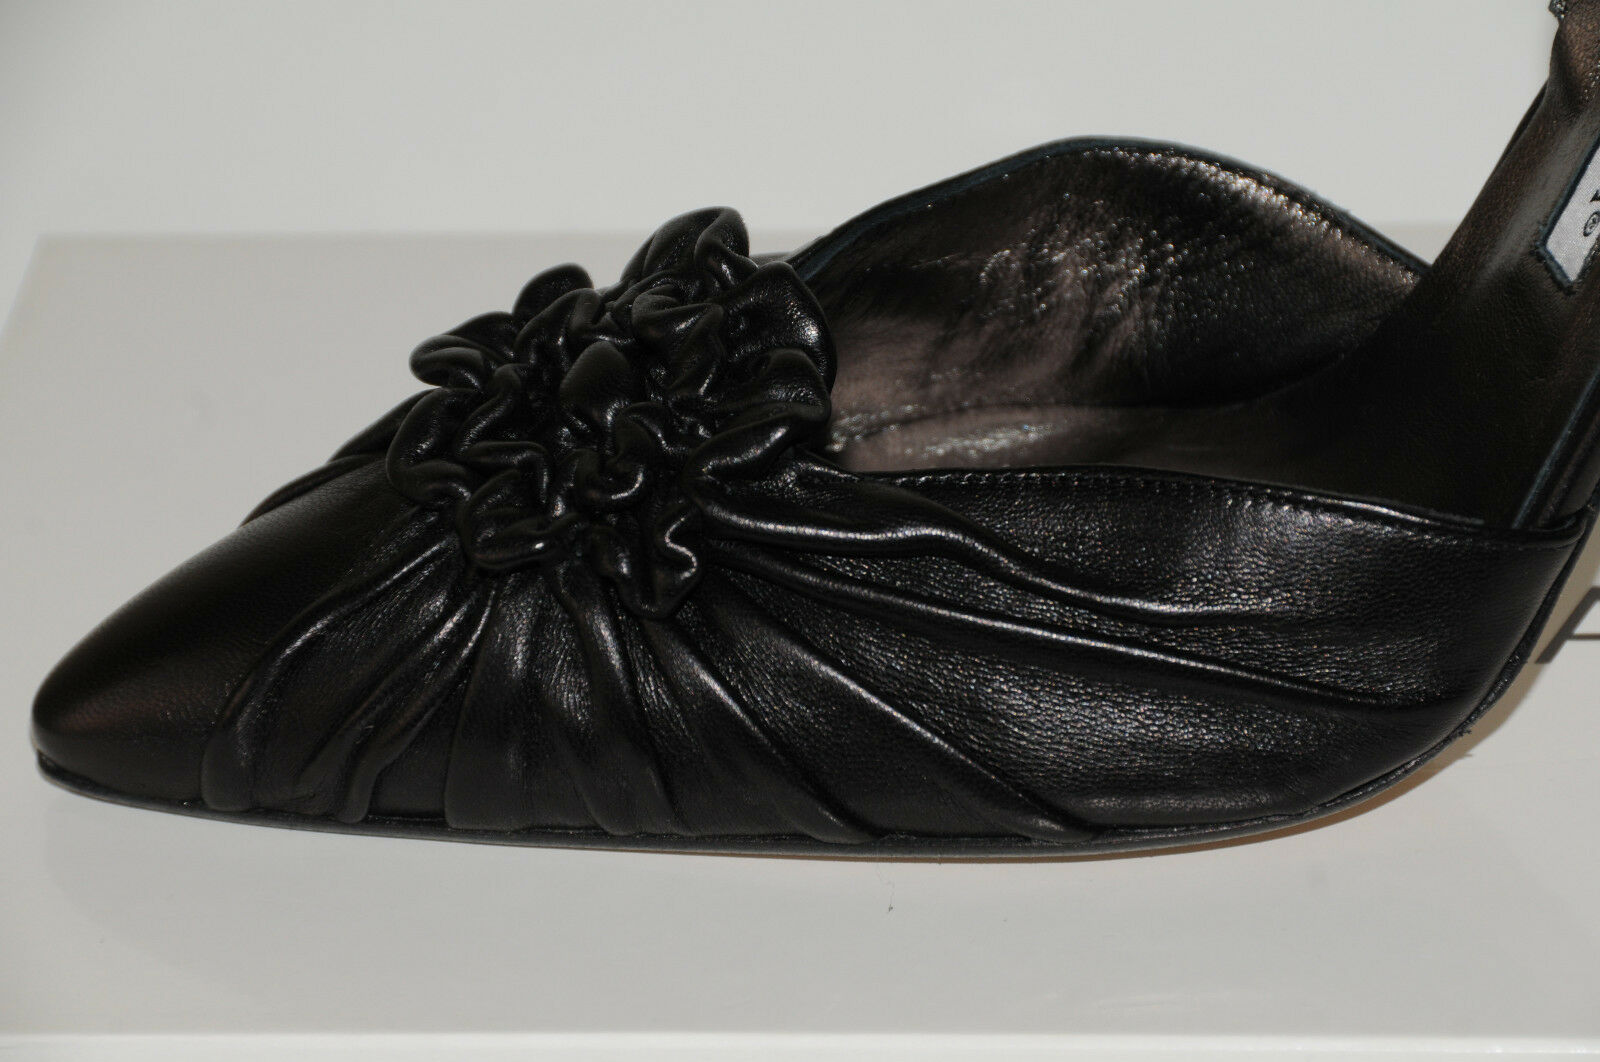 785 New MANOLO BLAHNIK Malattiasl  BLACK Leather Leather Leather Slings CAROLYNE SHOES 36.5 826fe2